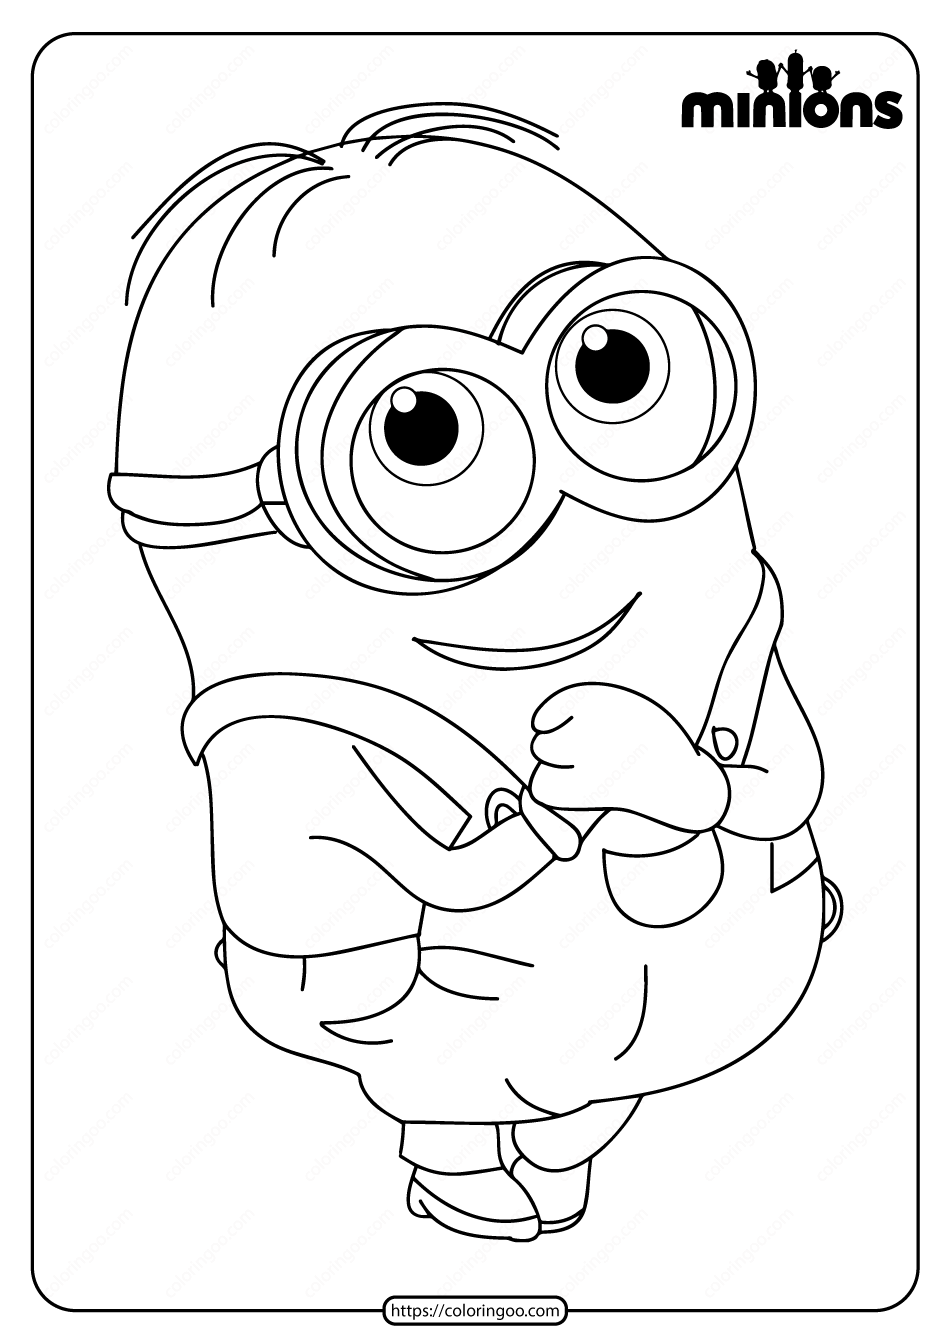 Printable Minions Pdf Coloring Page